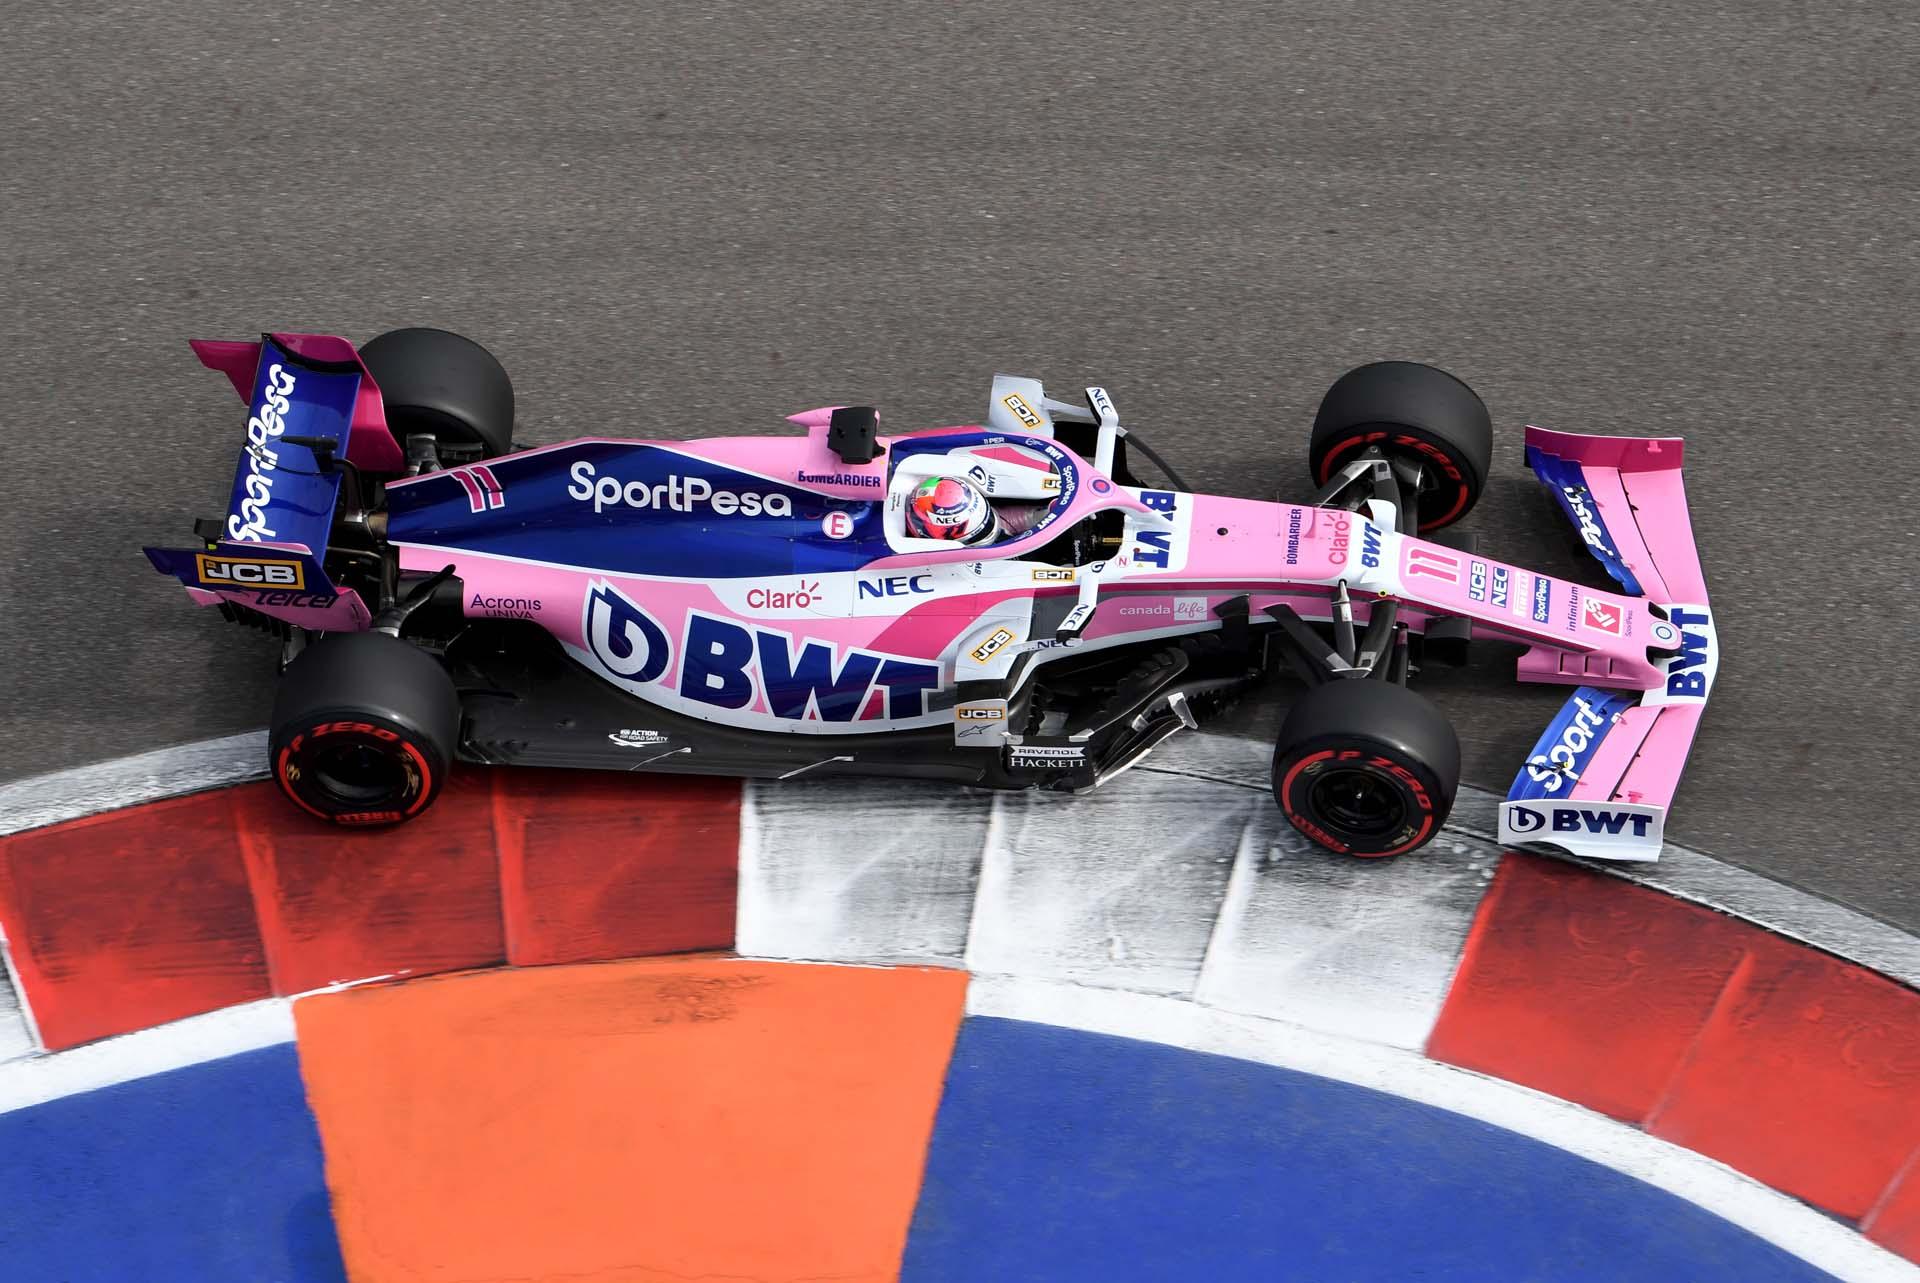 RussianGP2019_FRI_RacingP_DSC_8568